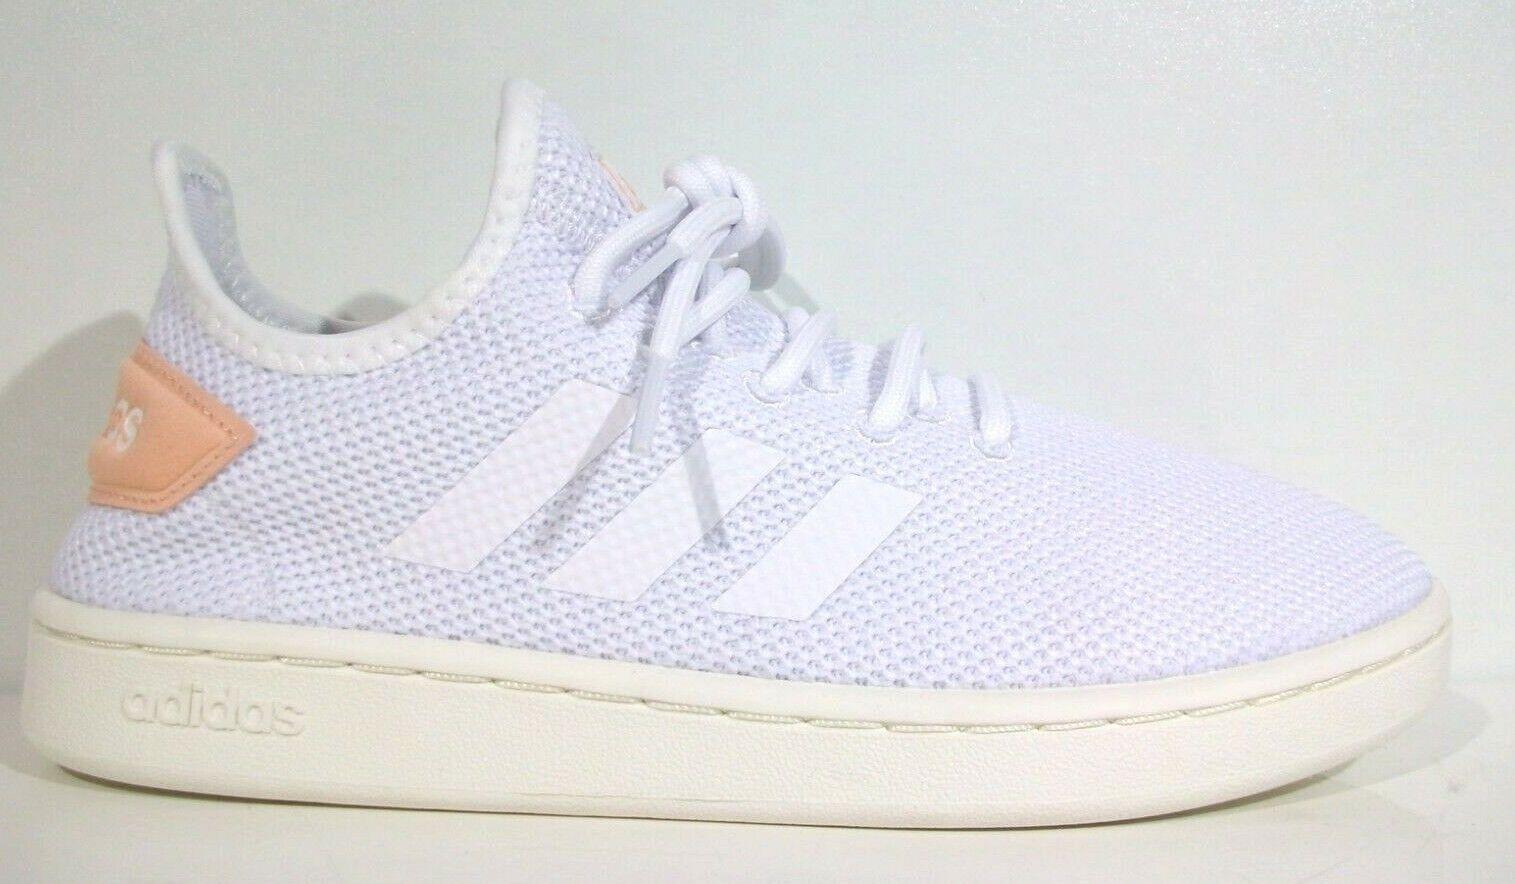 Adidas Damen Turnschuhe Turnschuhe F36476  COURT ADAPT weiß Größe 38-41